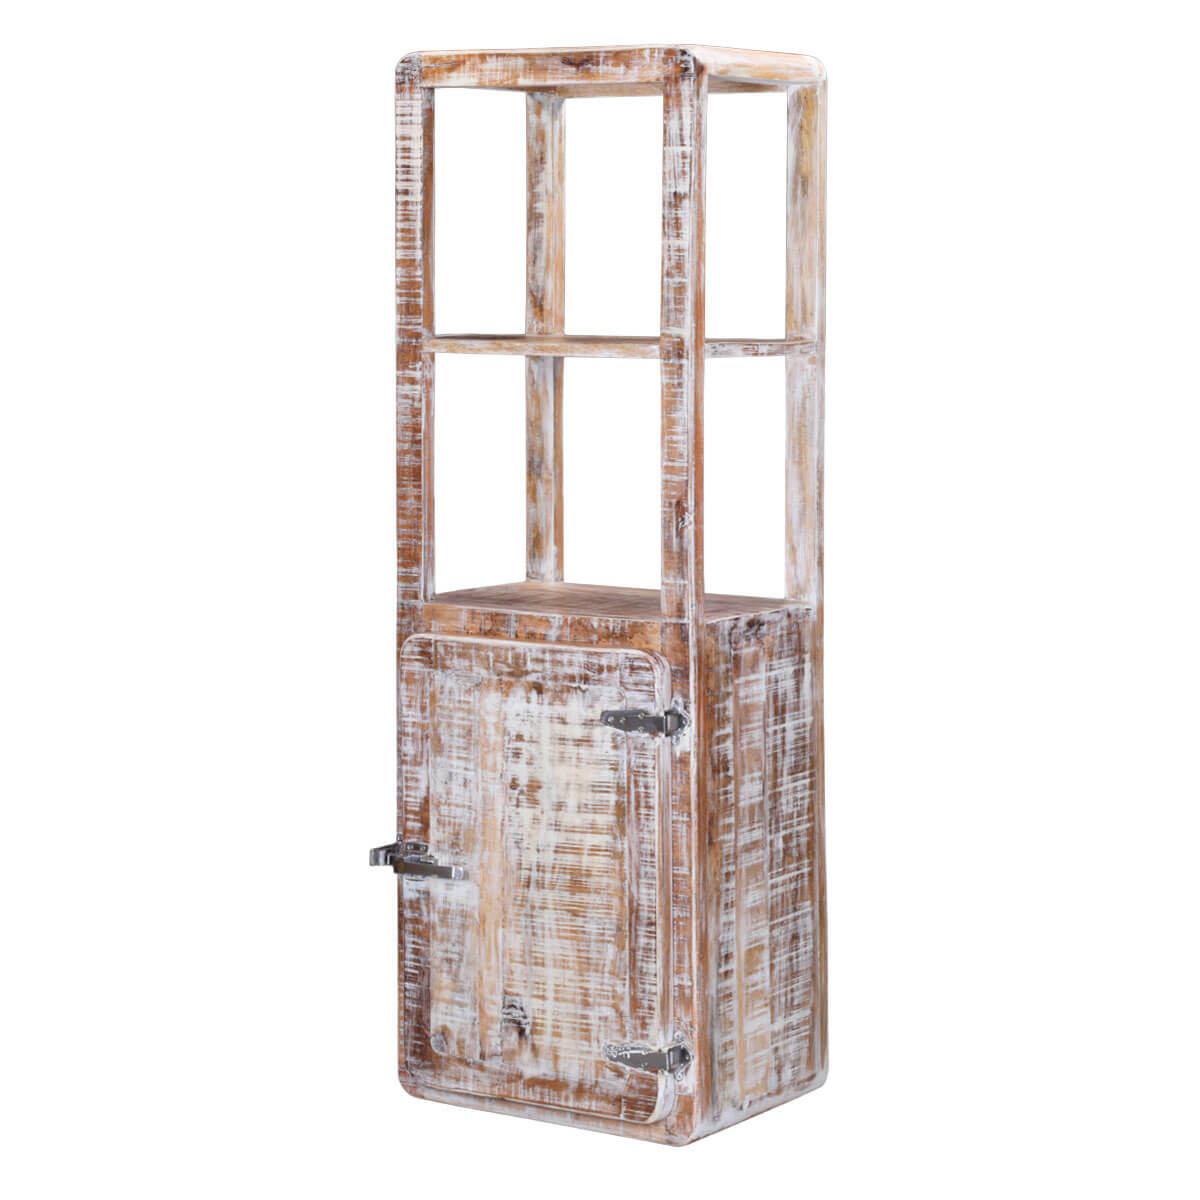 Roanoke 59 Handcrafted Solid Wood Display Cabinet